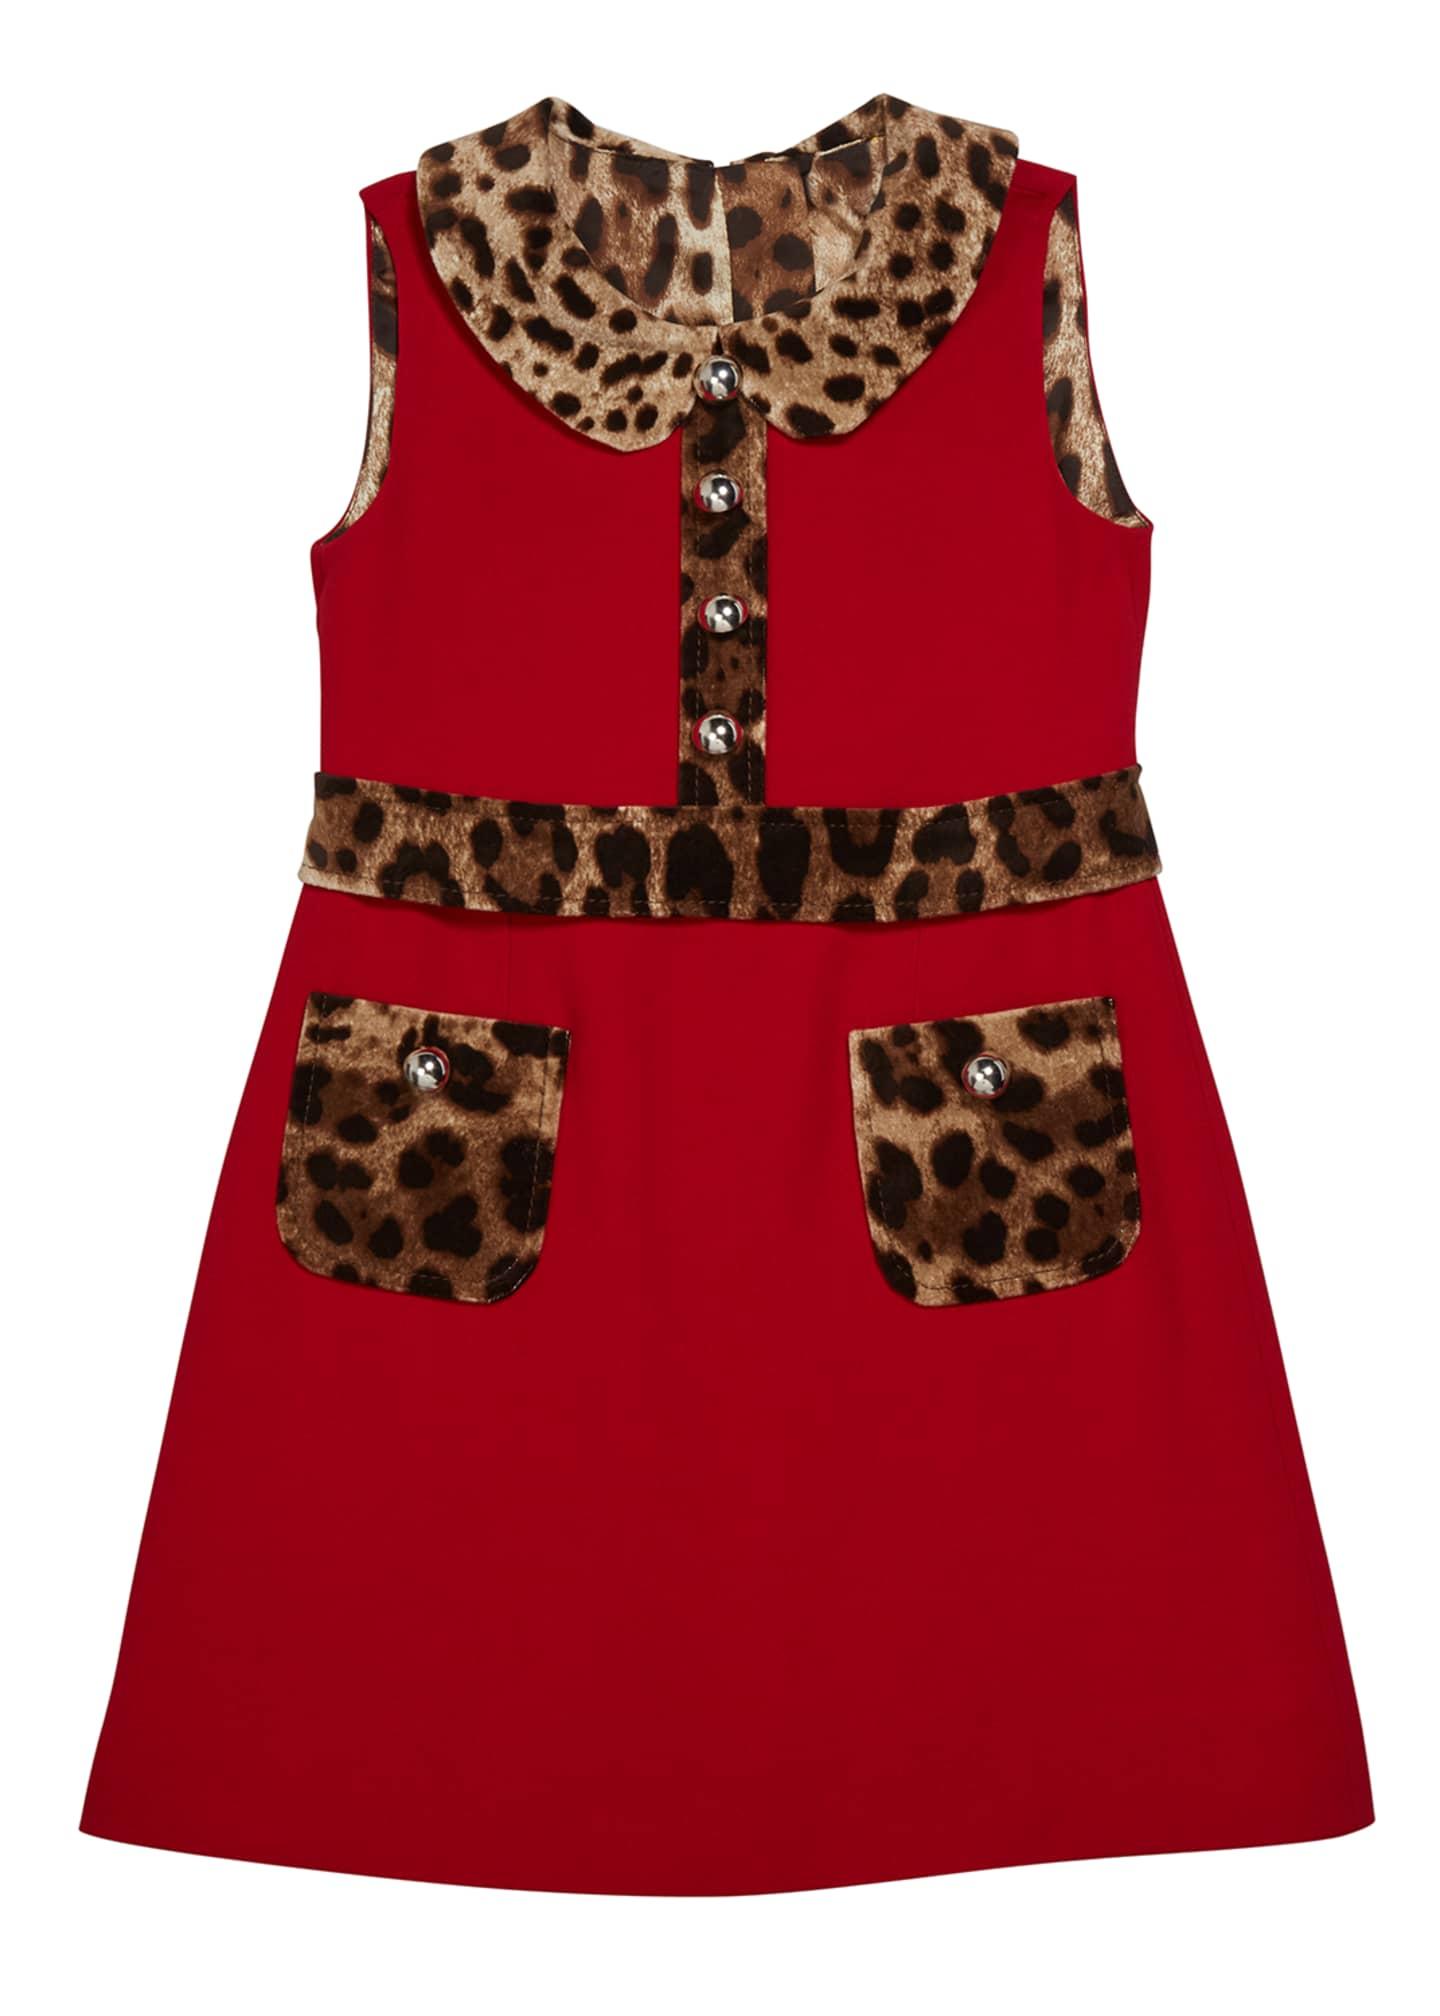 Dolce & Gabbana Girl's Sleeveless Dress w/ Animal-Print